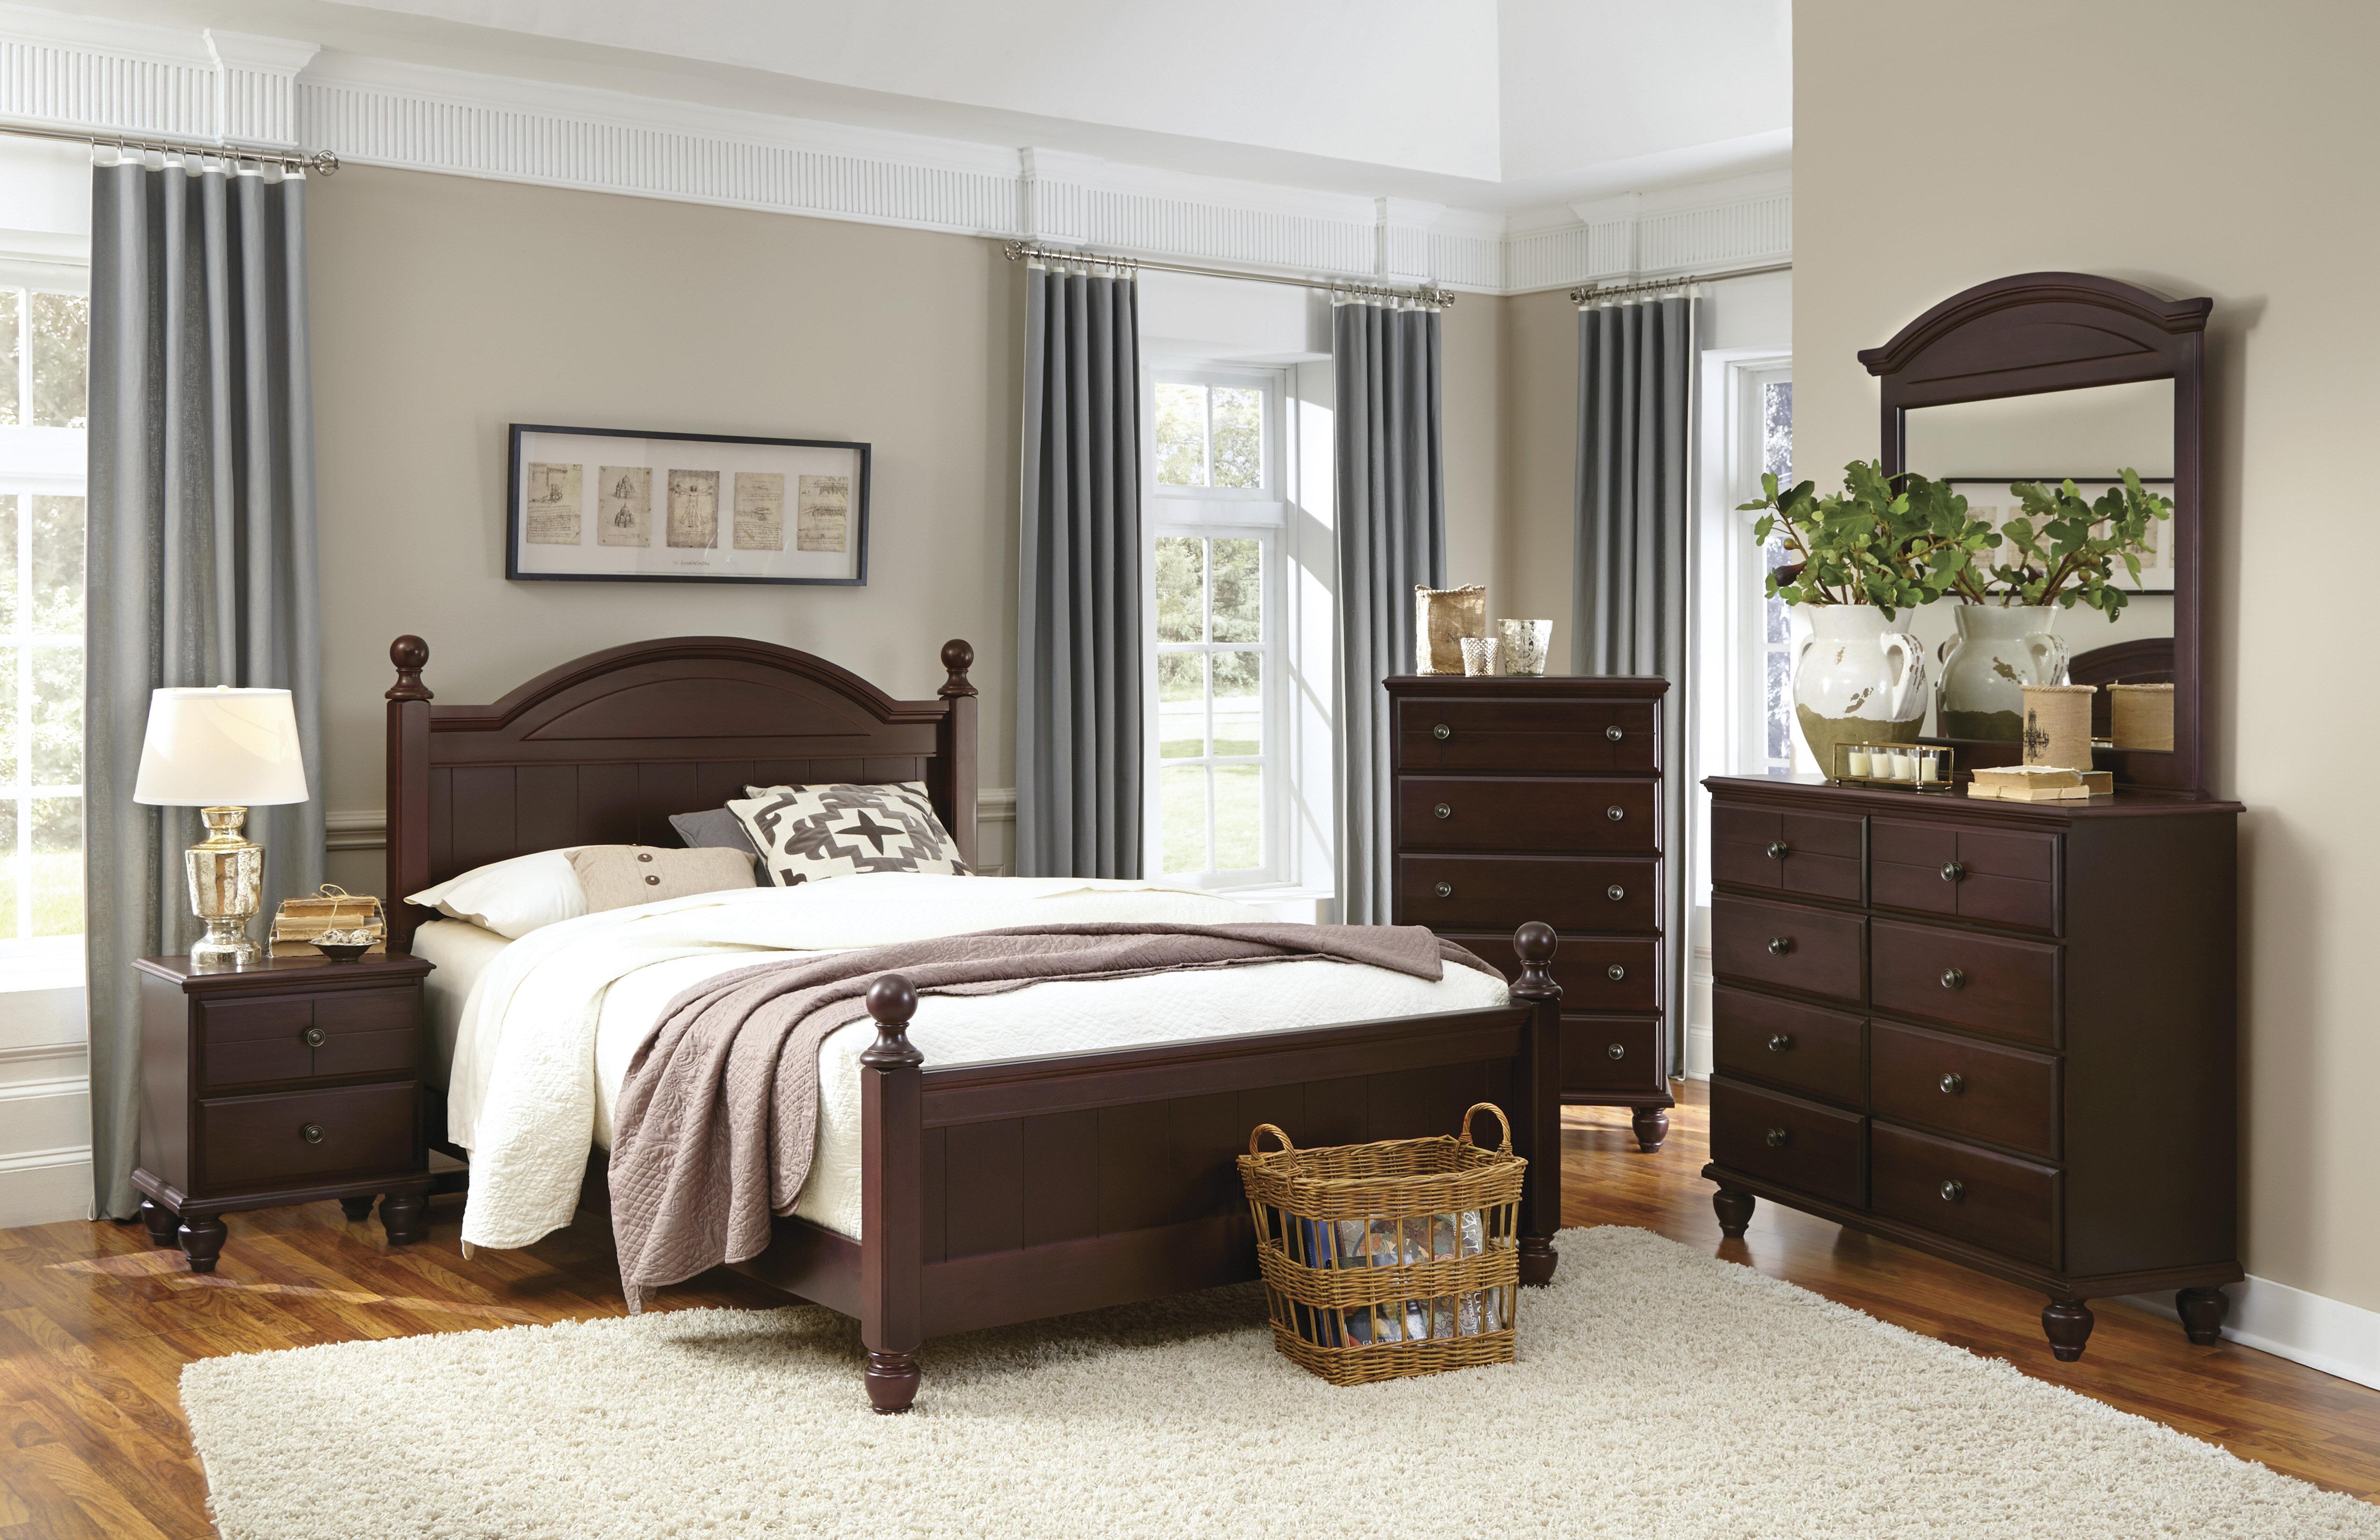 Carolina furniture works inc craftsman panel configurable bedroom set reviews wayfair